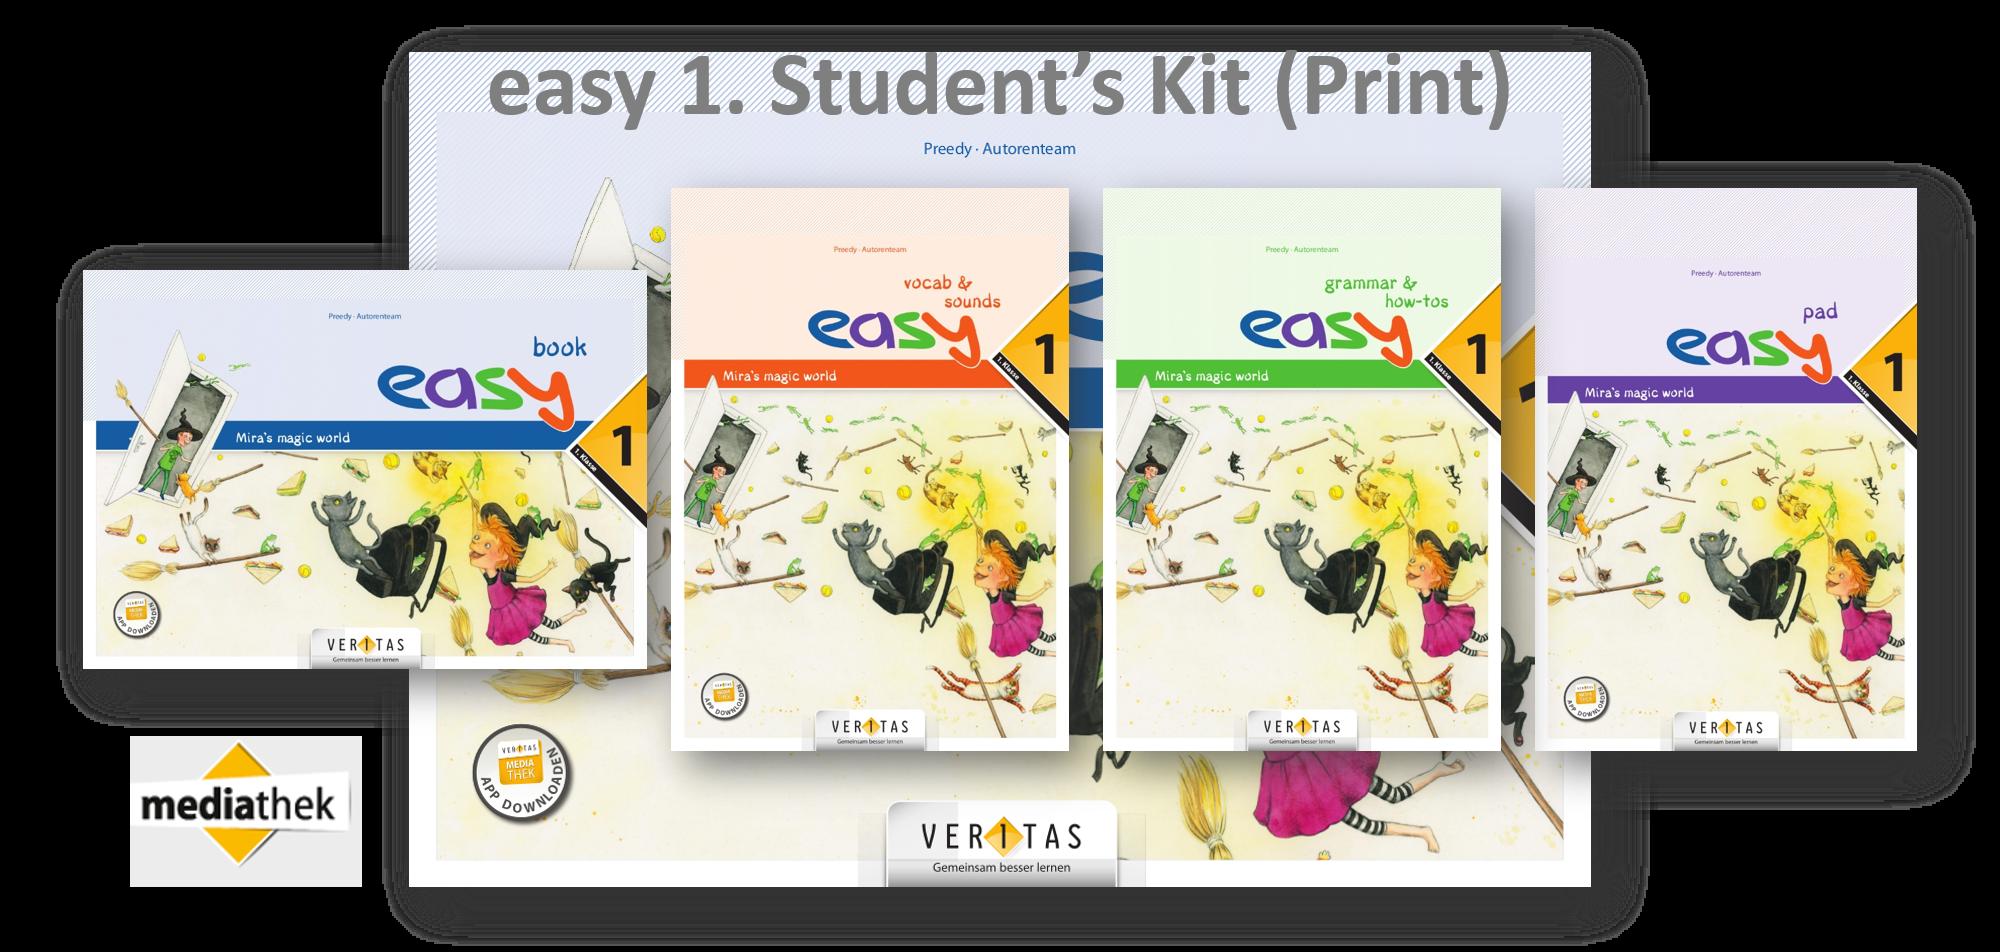 easy-FAQs: Alle Print-Komponenten von easy